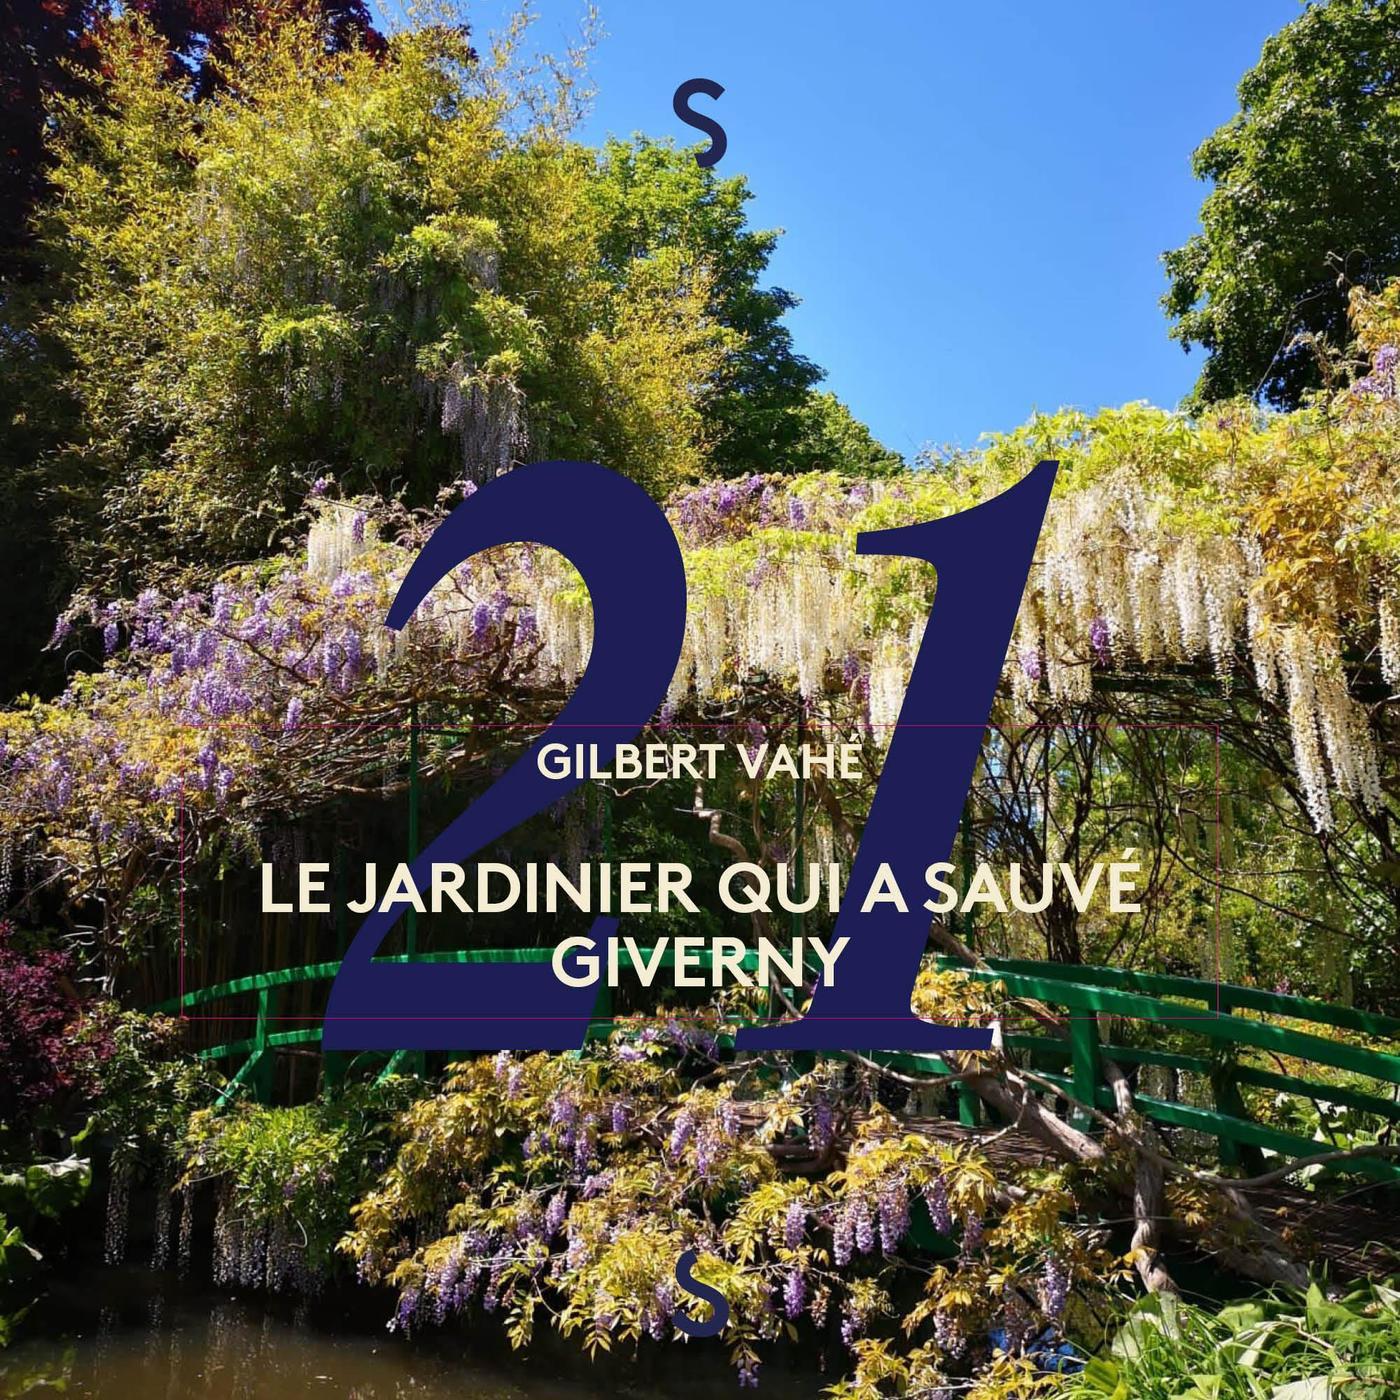 Le jardinier qui a sauvé Giverny